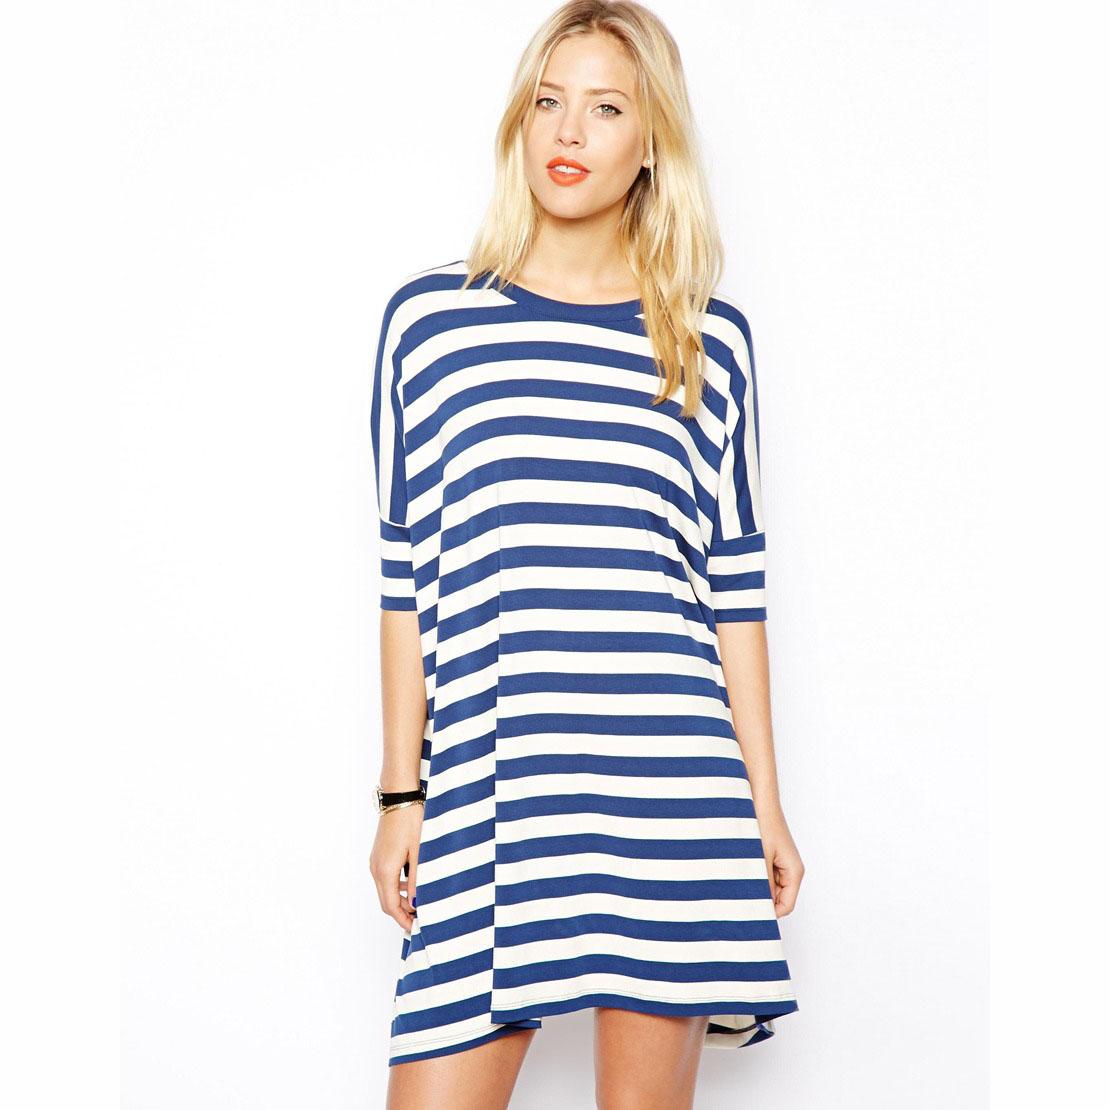 Blue Navy Wide Stripe 2014 Women Fashion Denim Sailor O-Neck Casual Striped Jeans Ladies Dress(China (Mainland))